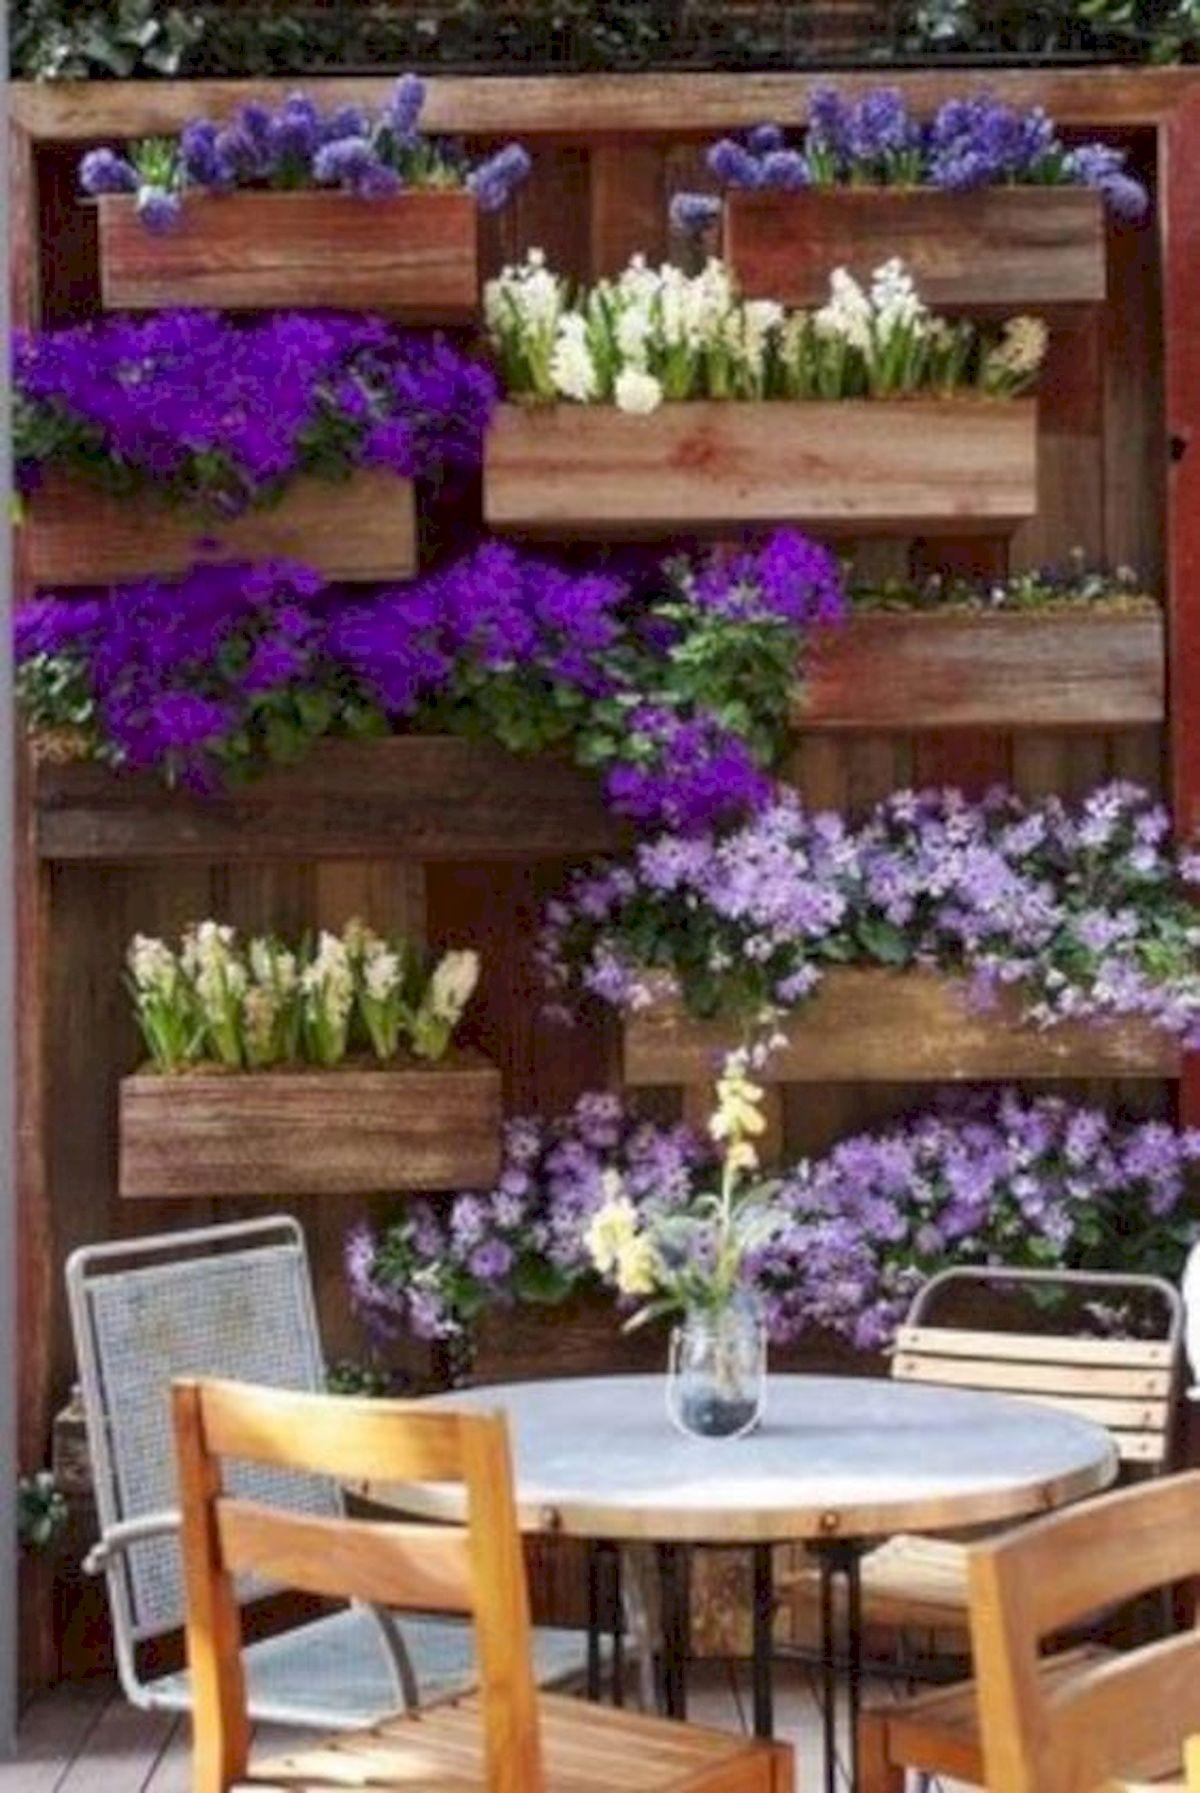 50 Awesome DIY Hanging Plants Ideas For Modern Backyard Garden (17)